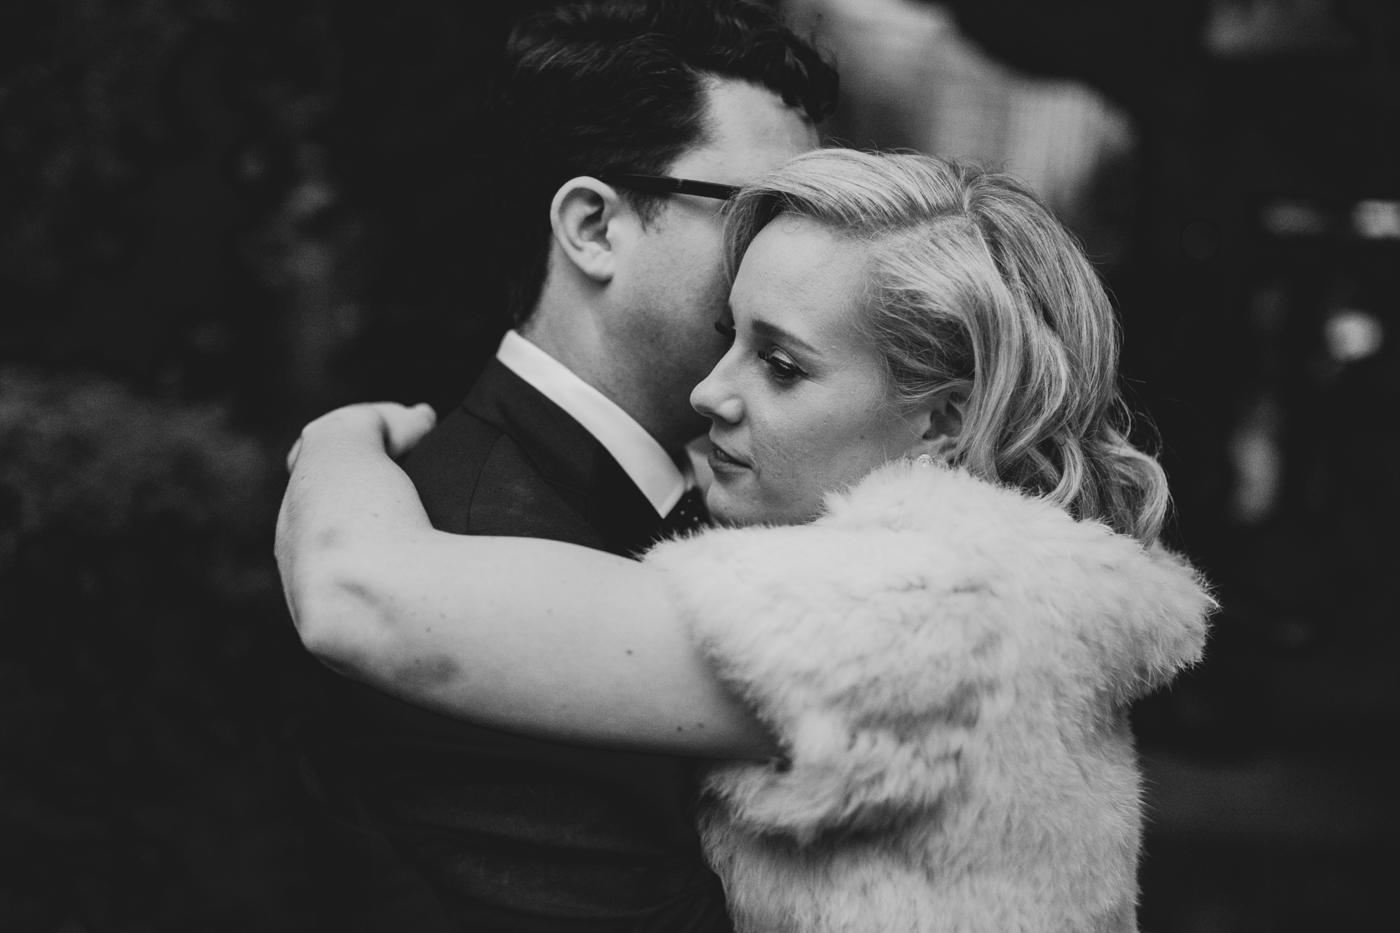 Jo & Tom Wedding - The Grounds of Alexandria - Samantha Heather Photography-243.jpg